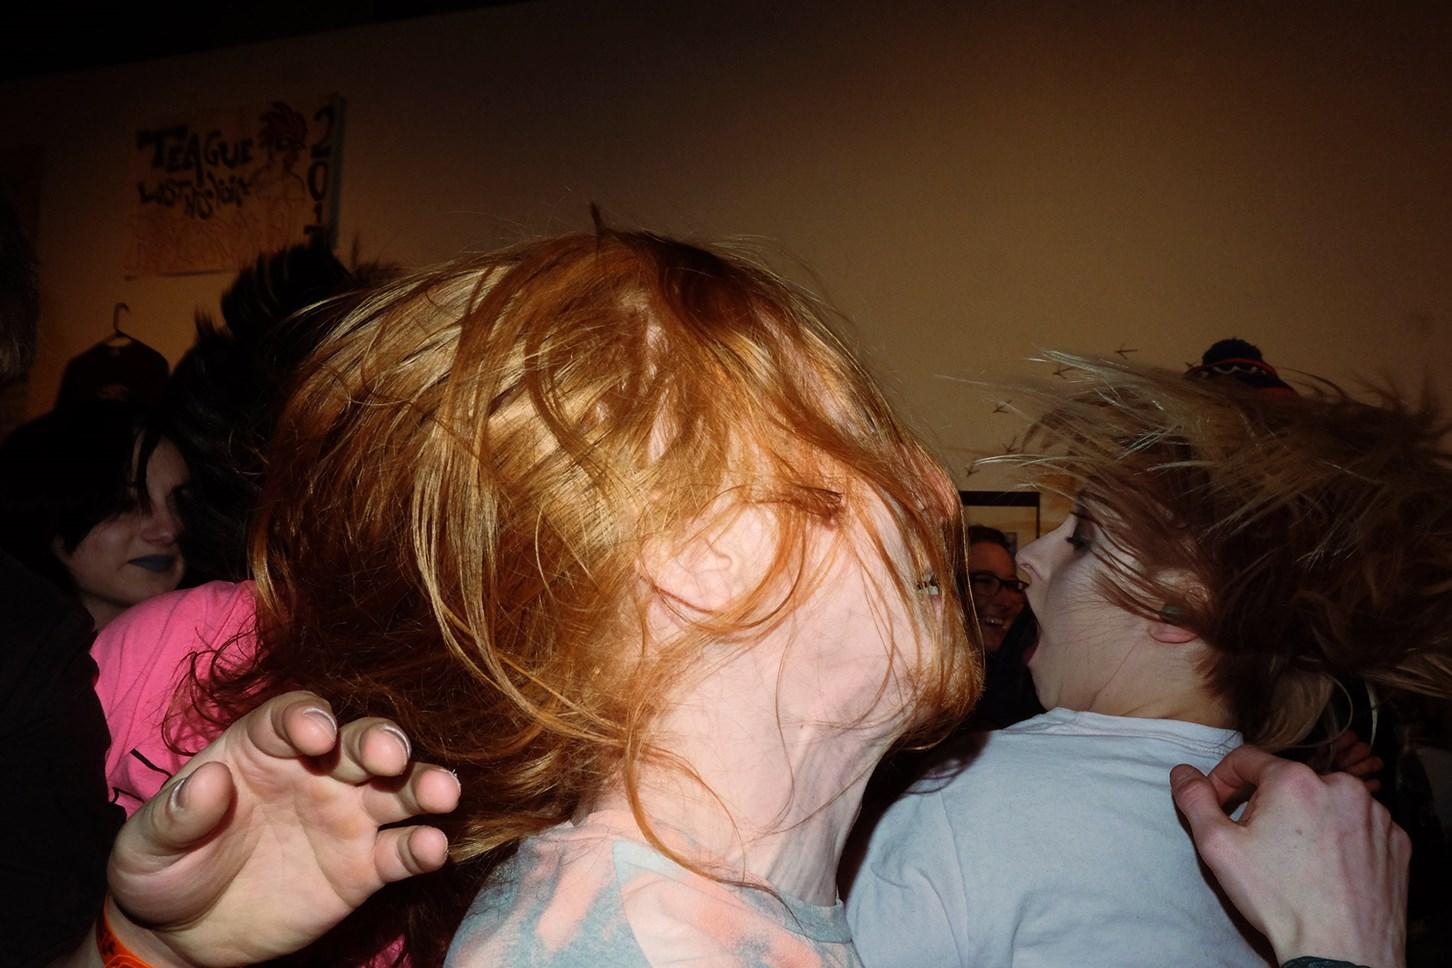 Night 3: Hair